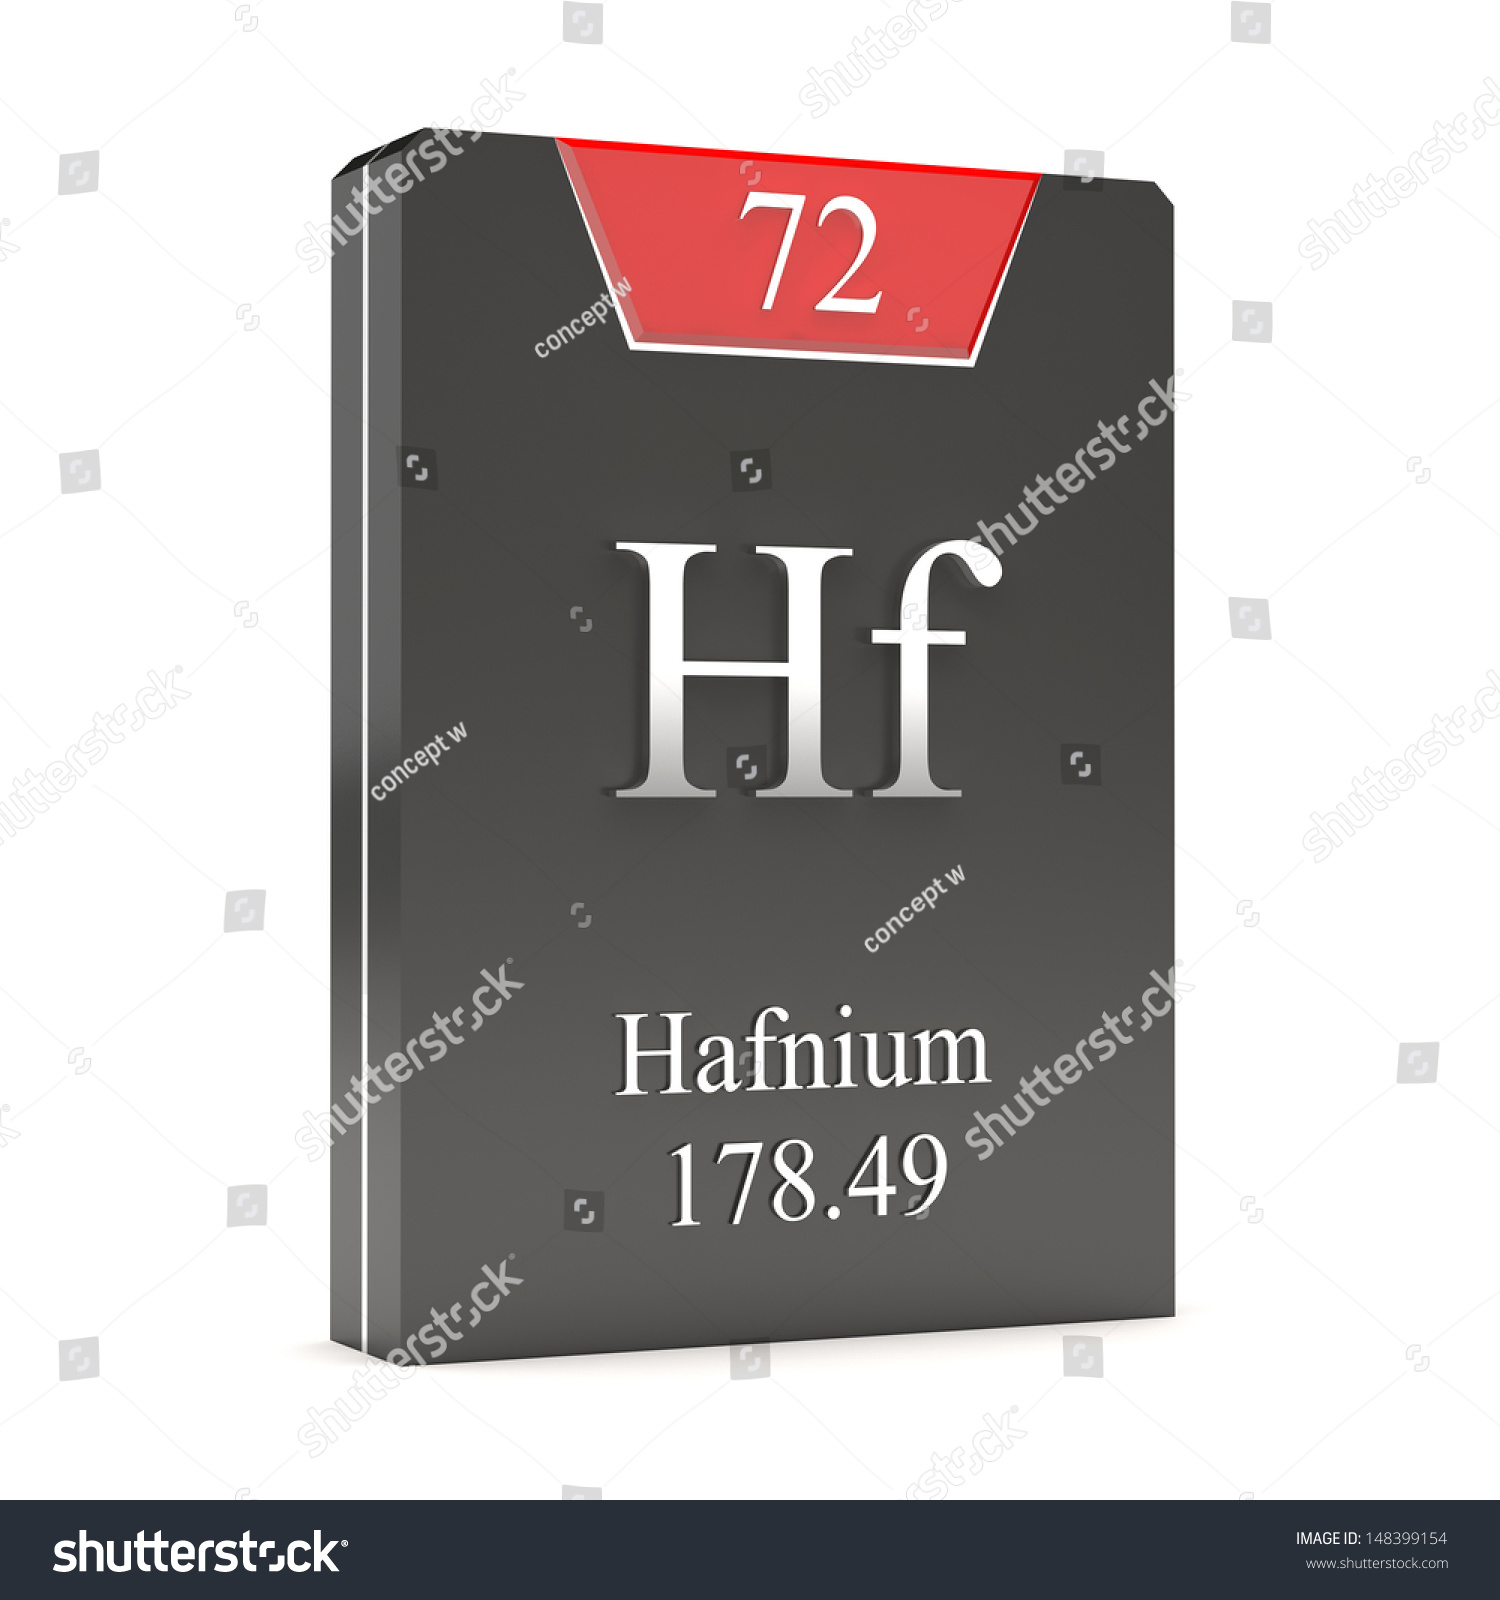 Hafnium hf 72 periodic table stock illustration 148399154 hafnium hf 72 from periodic table gamestrikefo Images